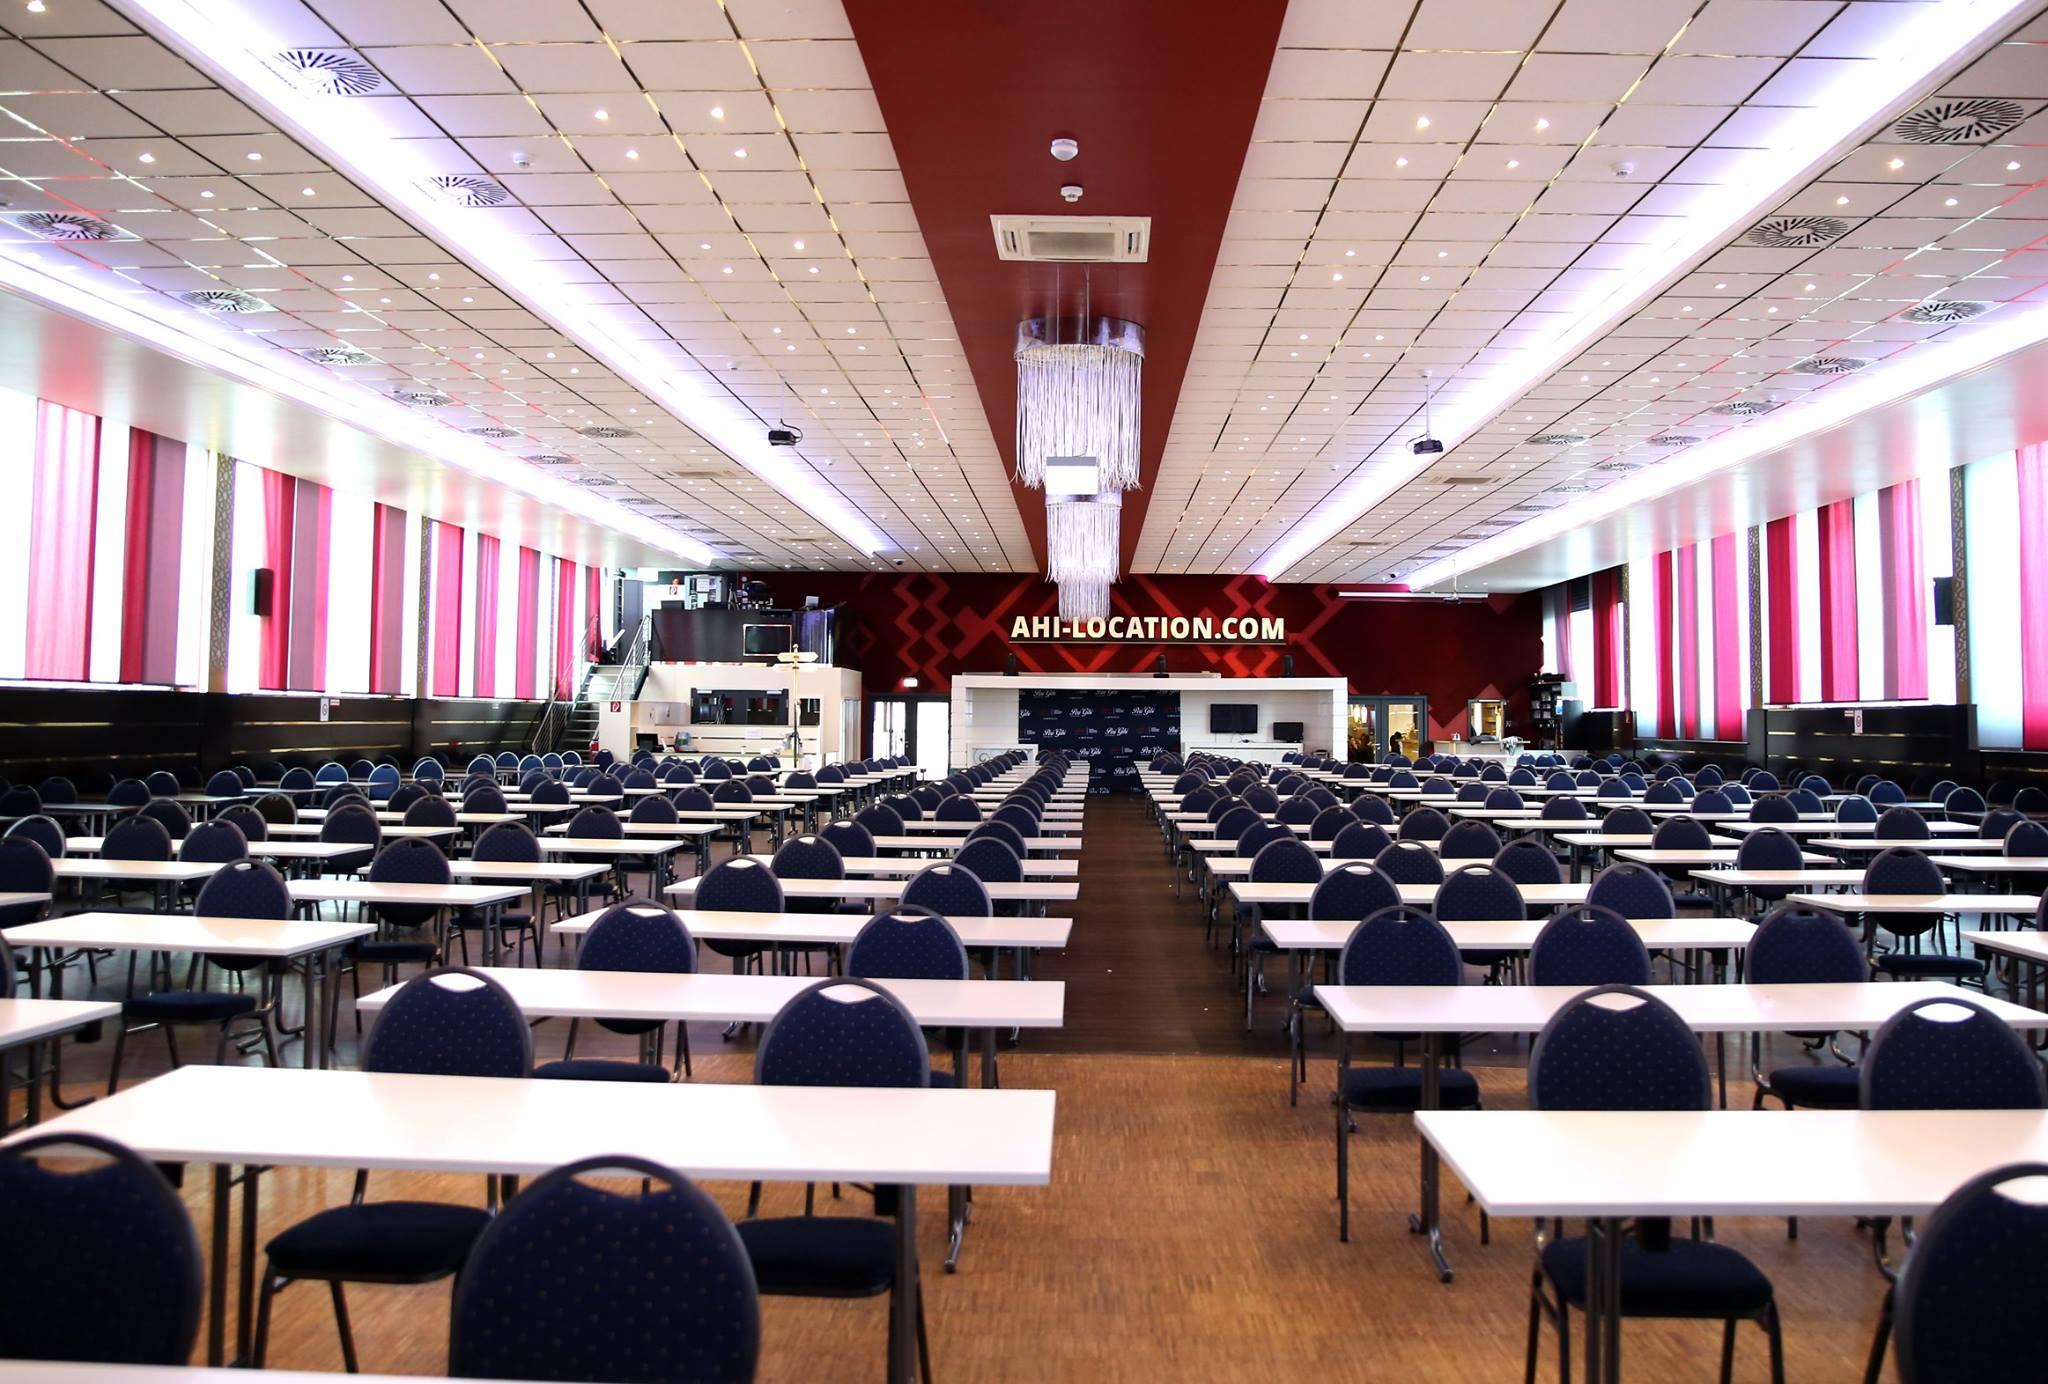 Ahi Event Location Ratingen Düsseldorf   Conferences